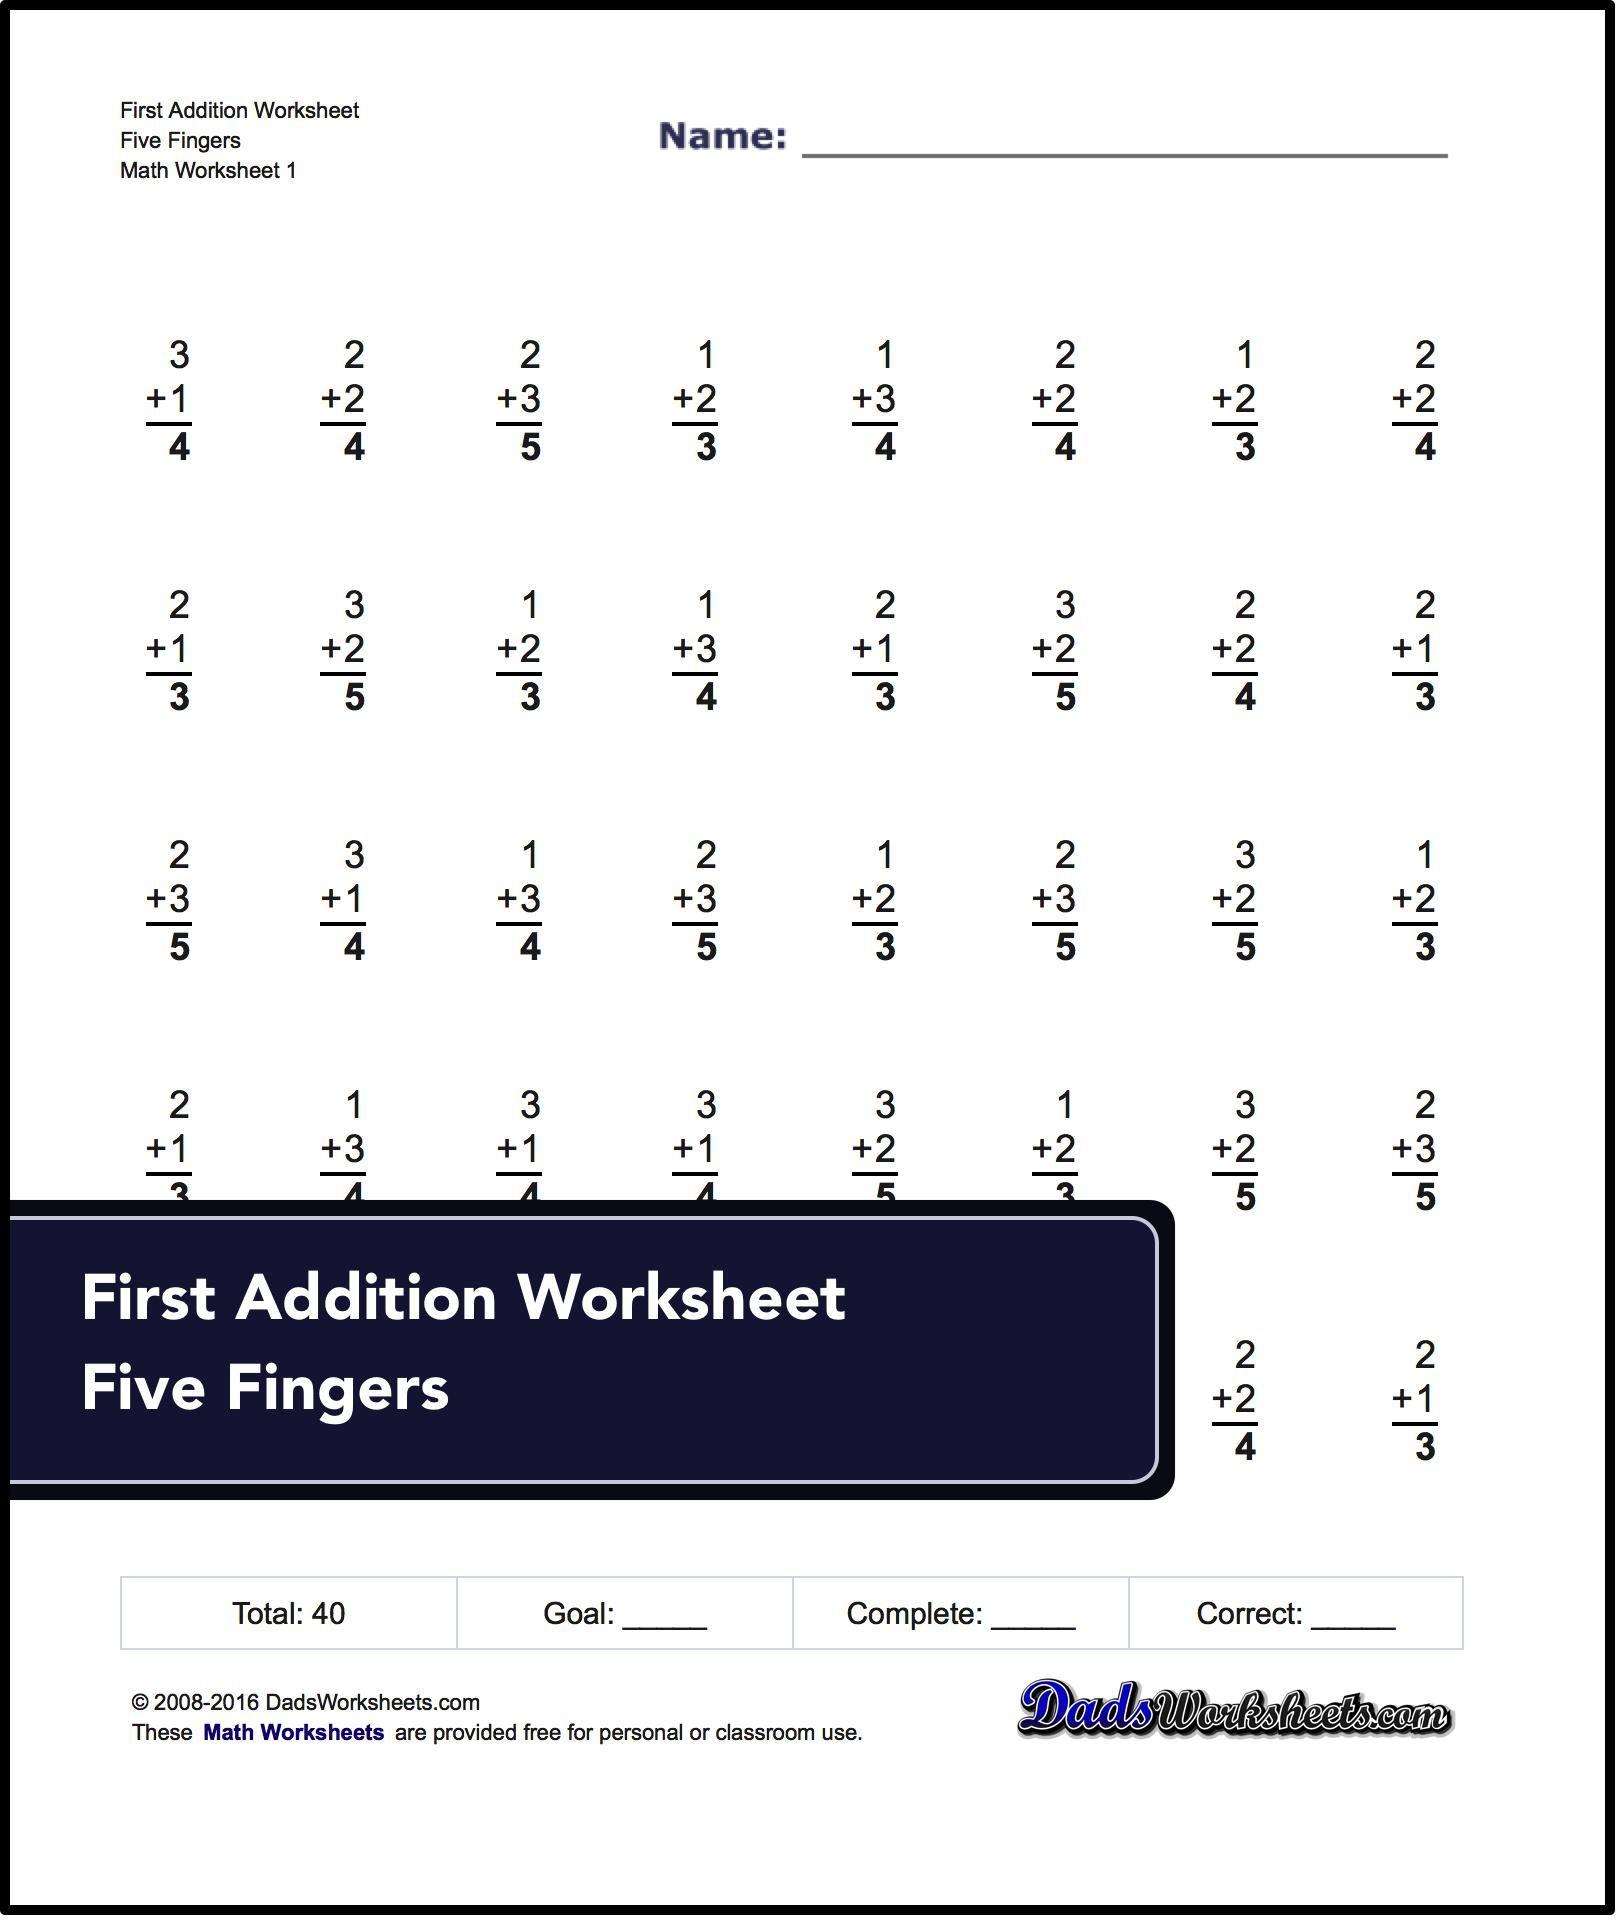 Starter Worksheets For Preschool And Kindergarten Math